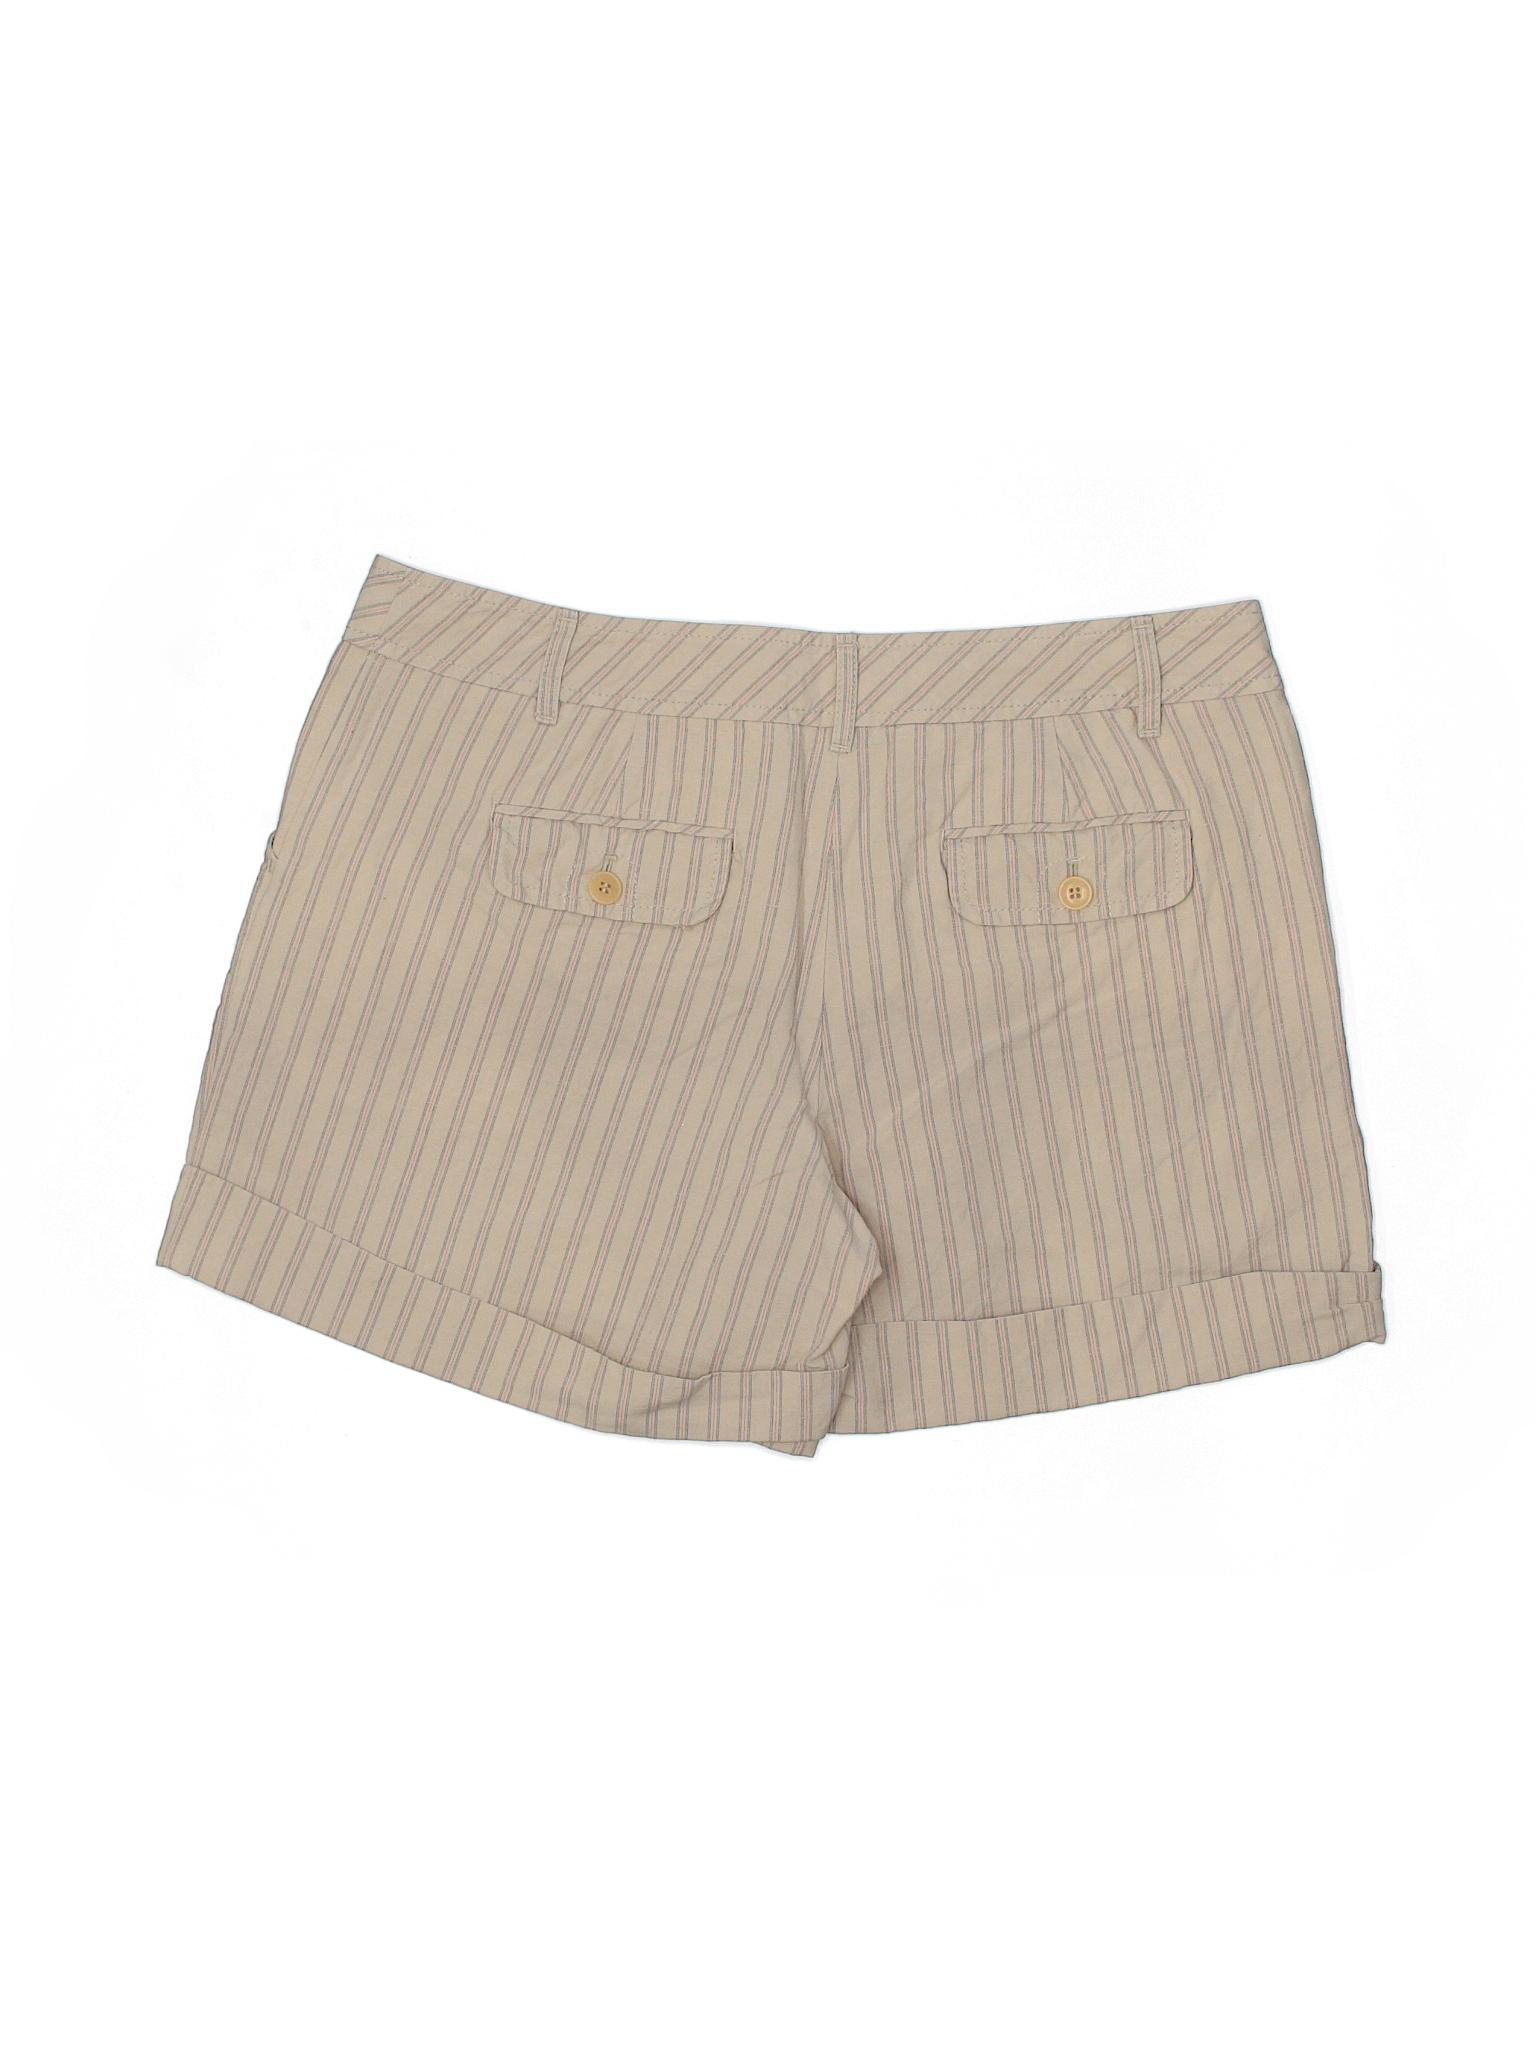 LOFT Shorts Boutique LOFT Taylor Ann Ann Shorts Boutique Ann Taylor Boutique wFqBxgznPf